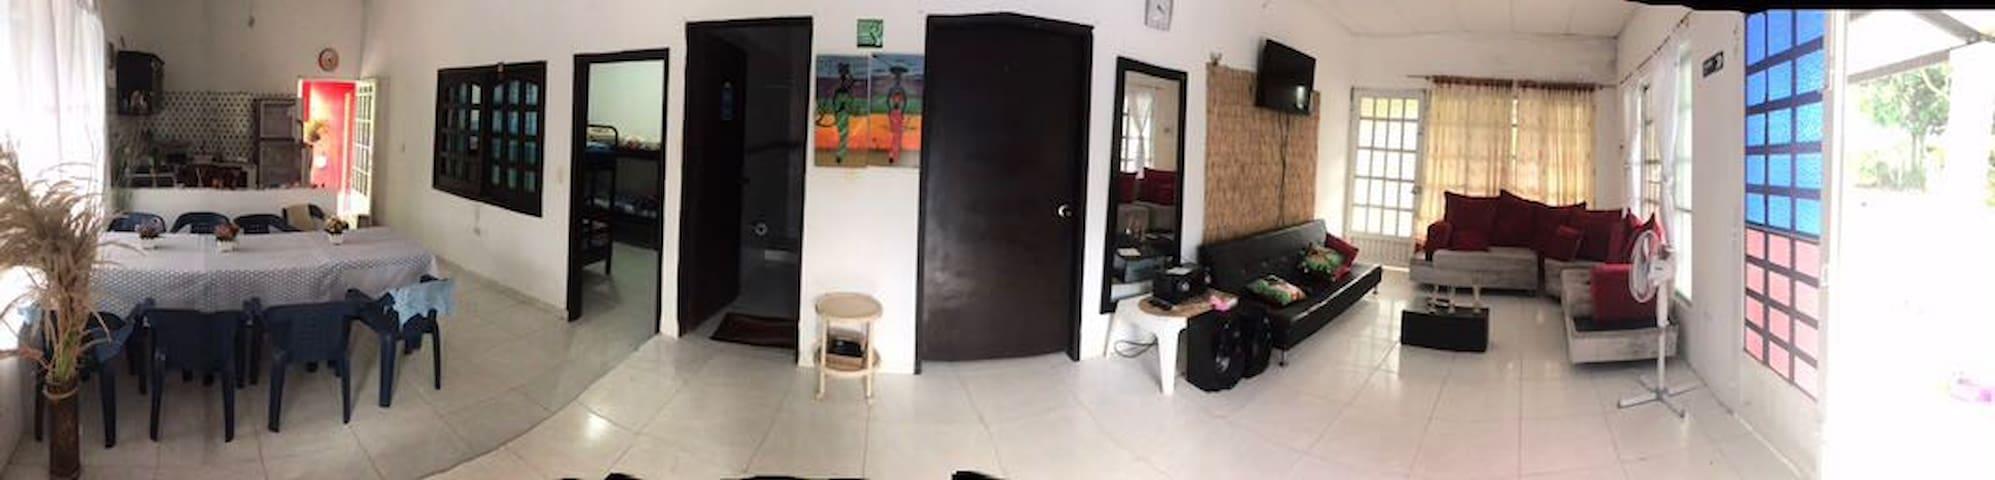 Casa campestre villa samara